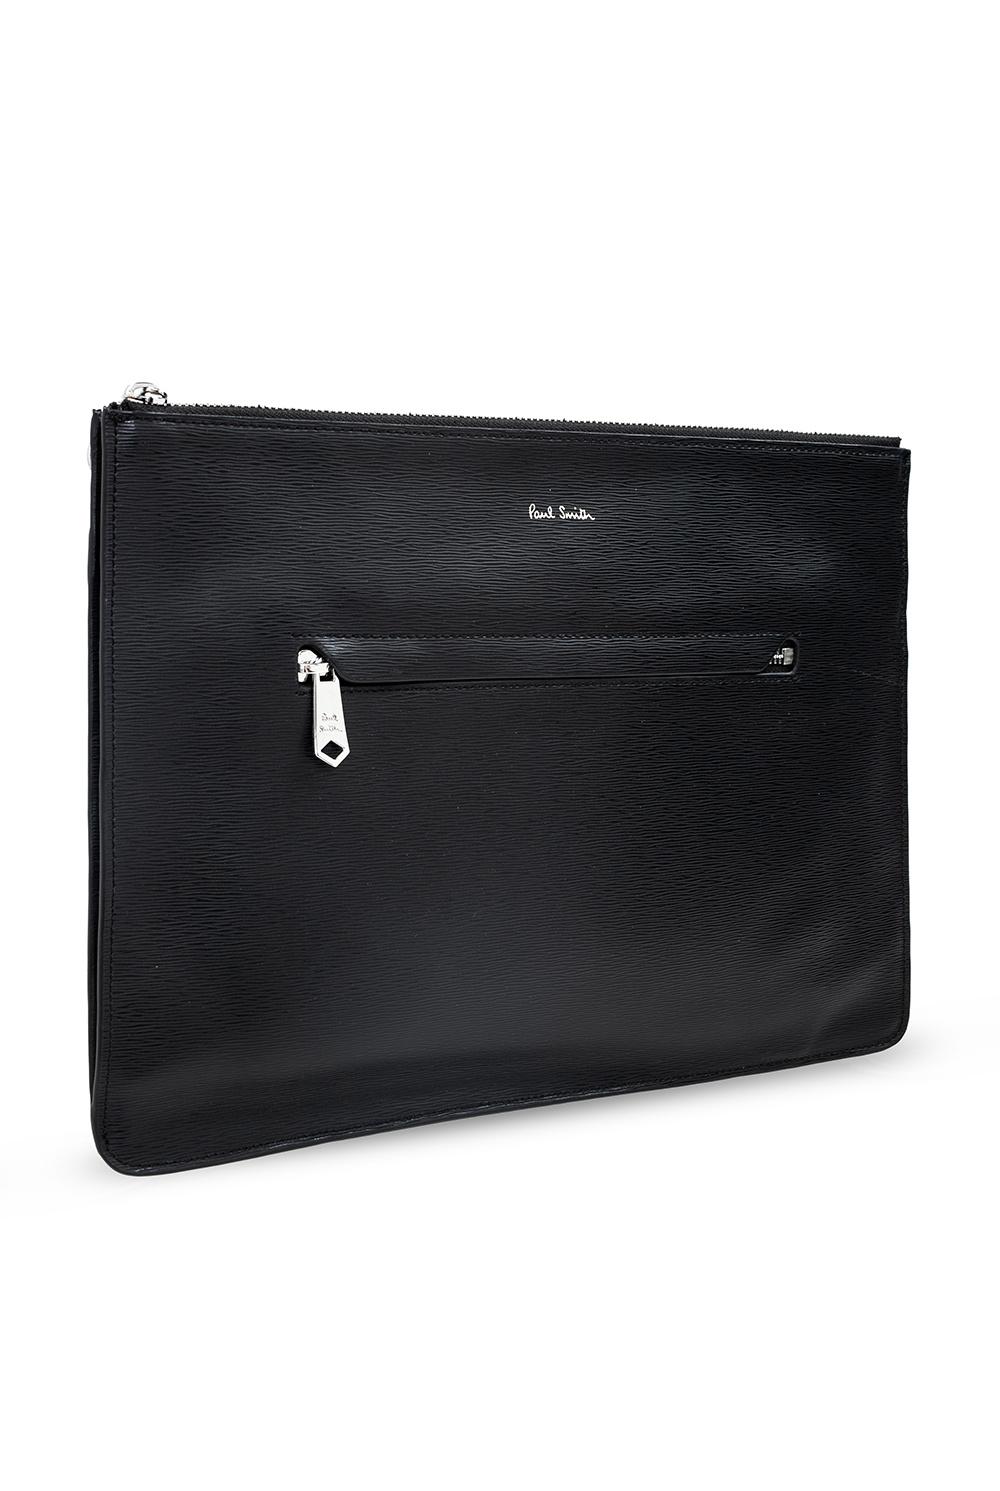 Paul Smith Leather hand bag